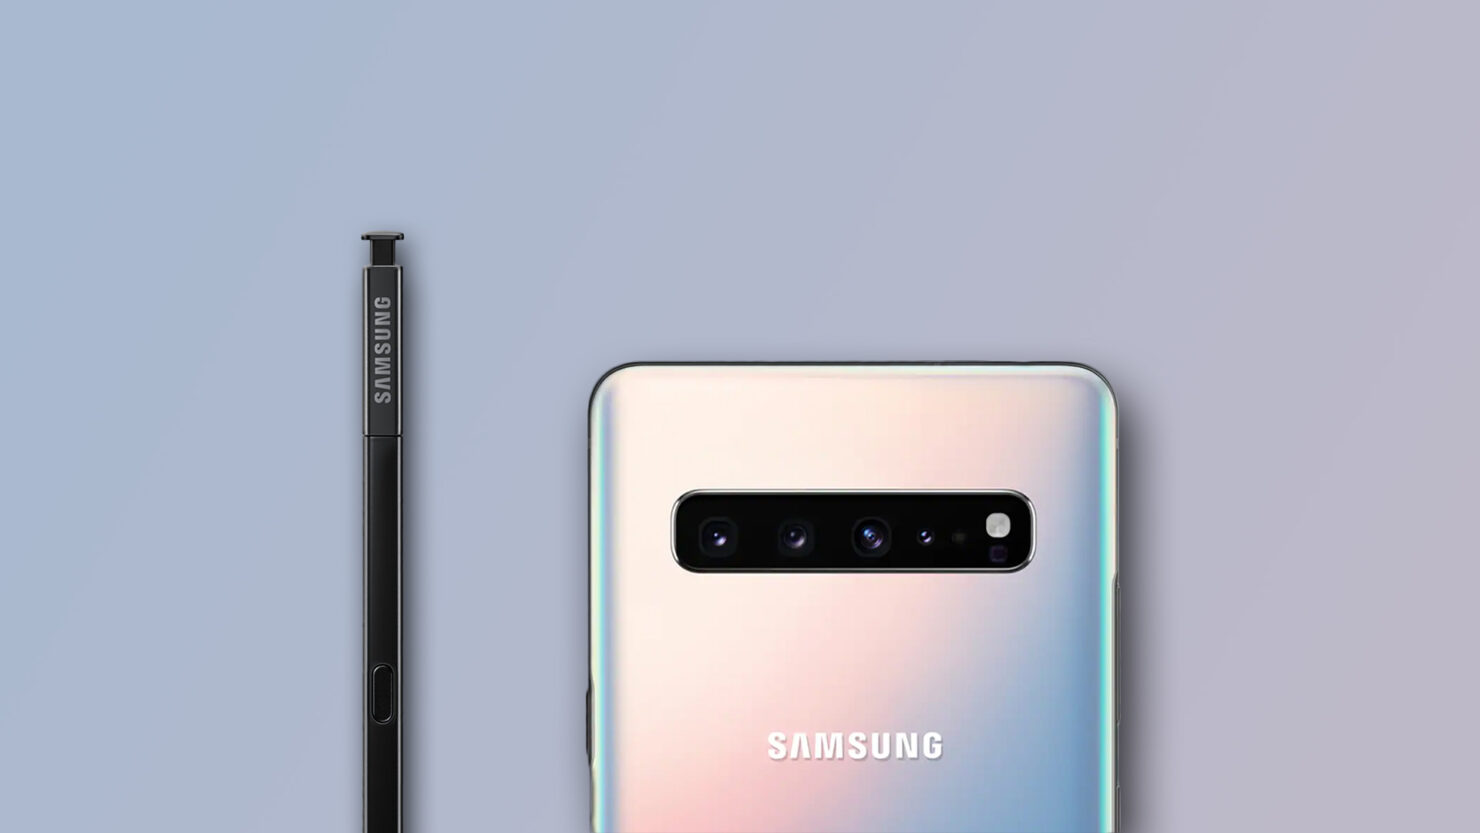 Samsung Galaxy Note 10 smaller version